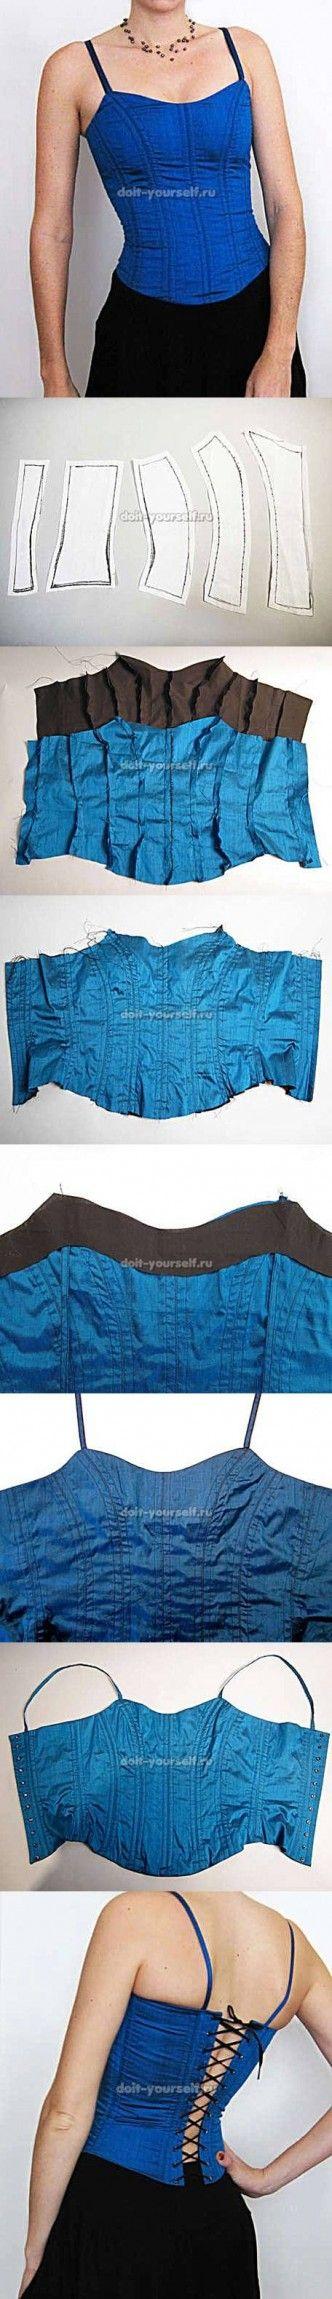 DIY Stylish Corset DIY Projects